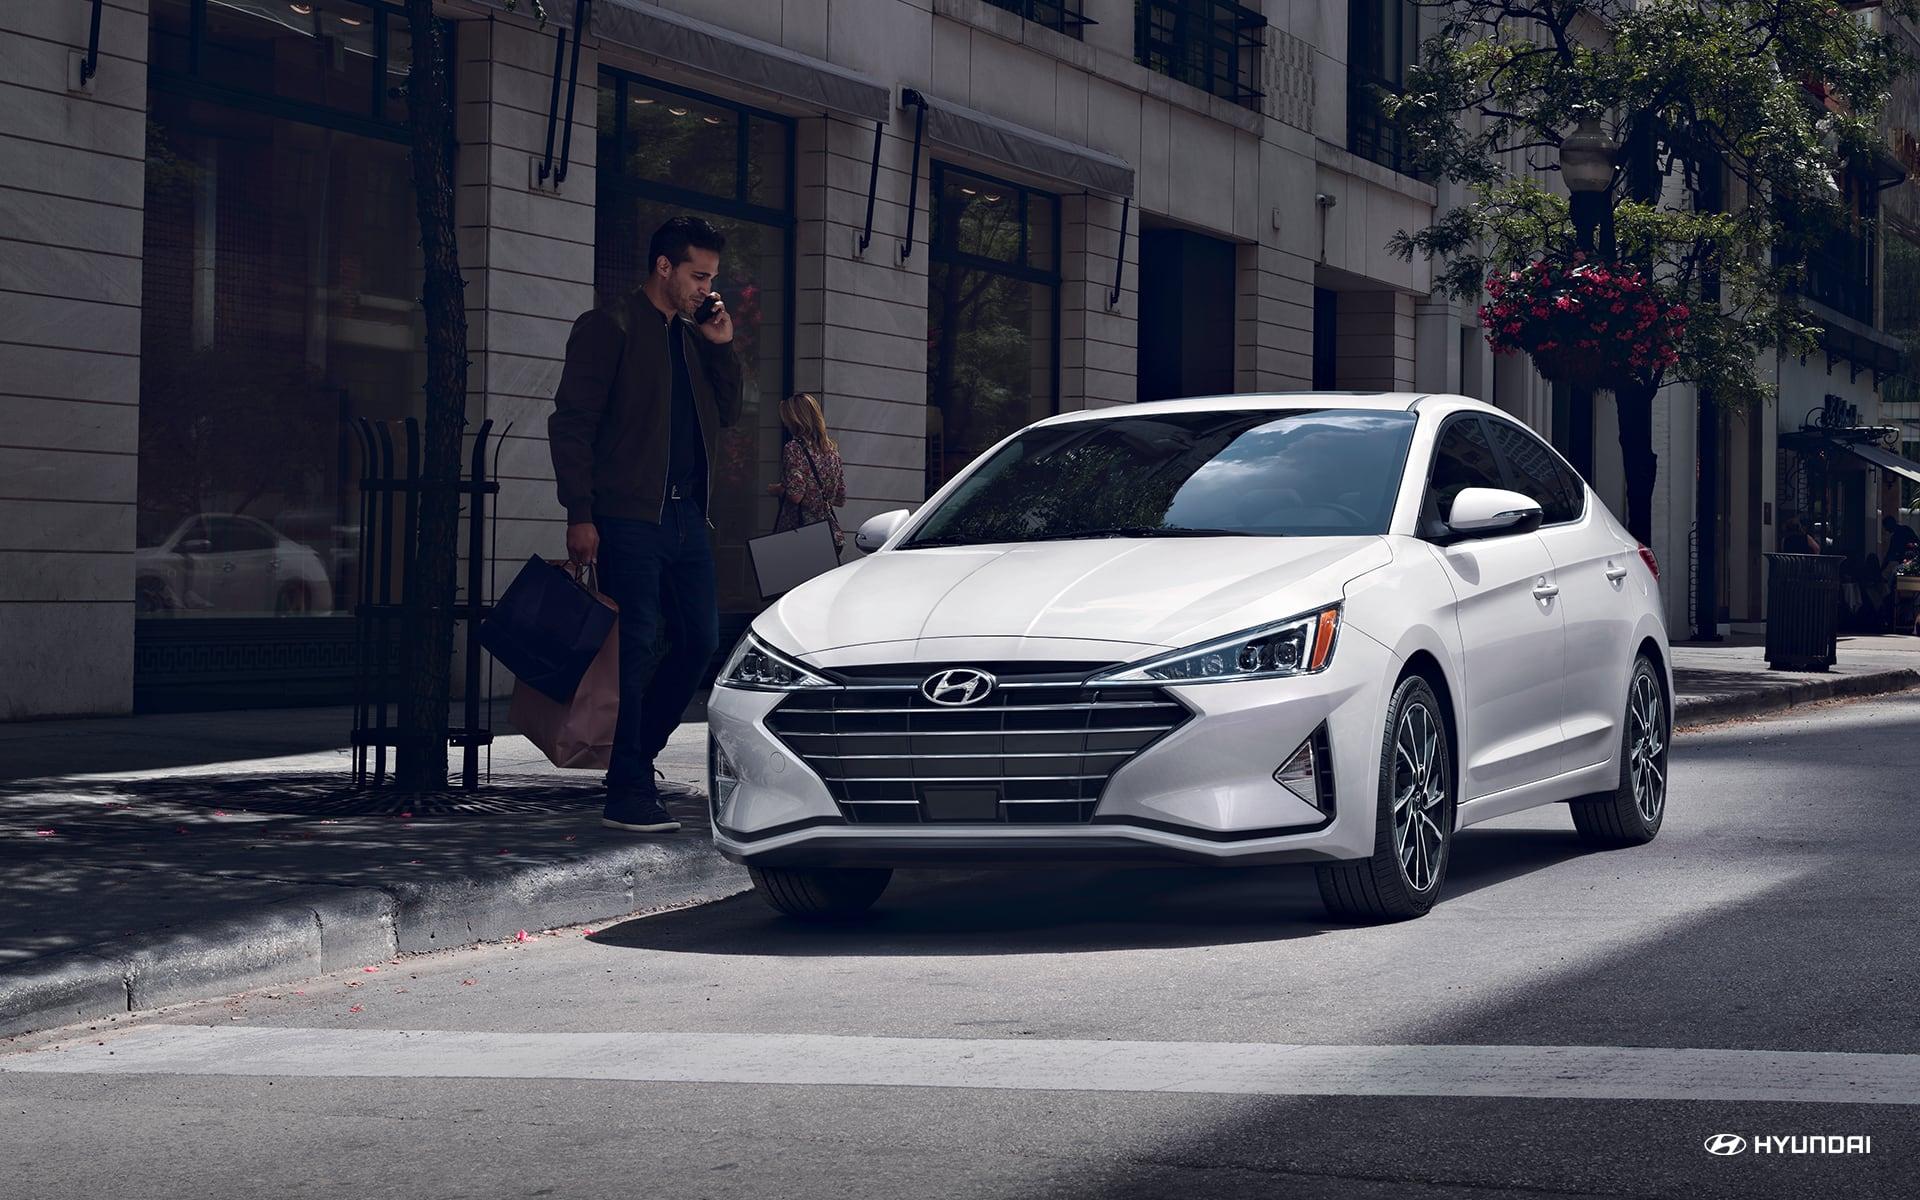 2020 Hyundai Elantra Trim Levels in Capitol Heights, MD